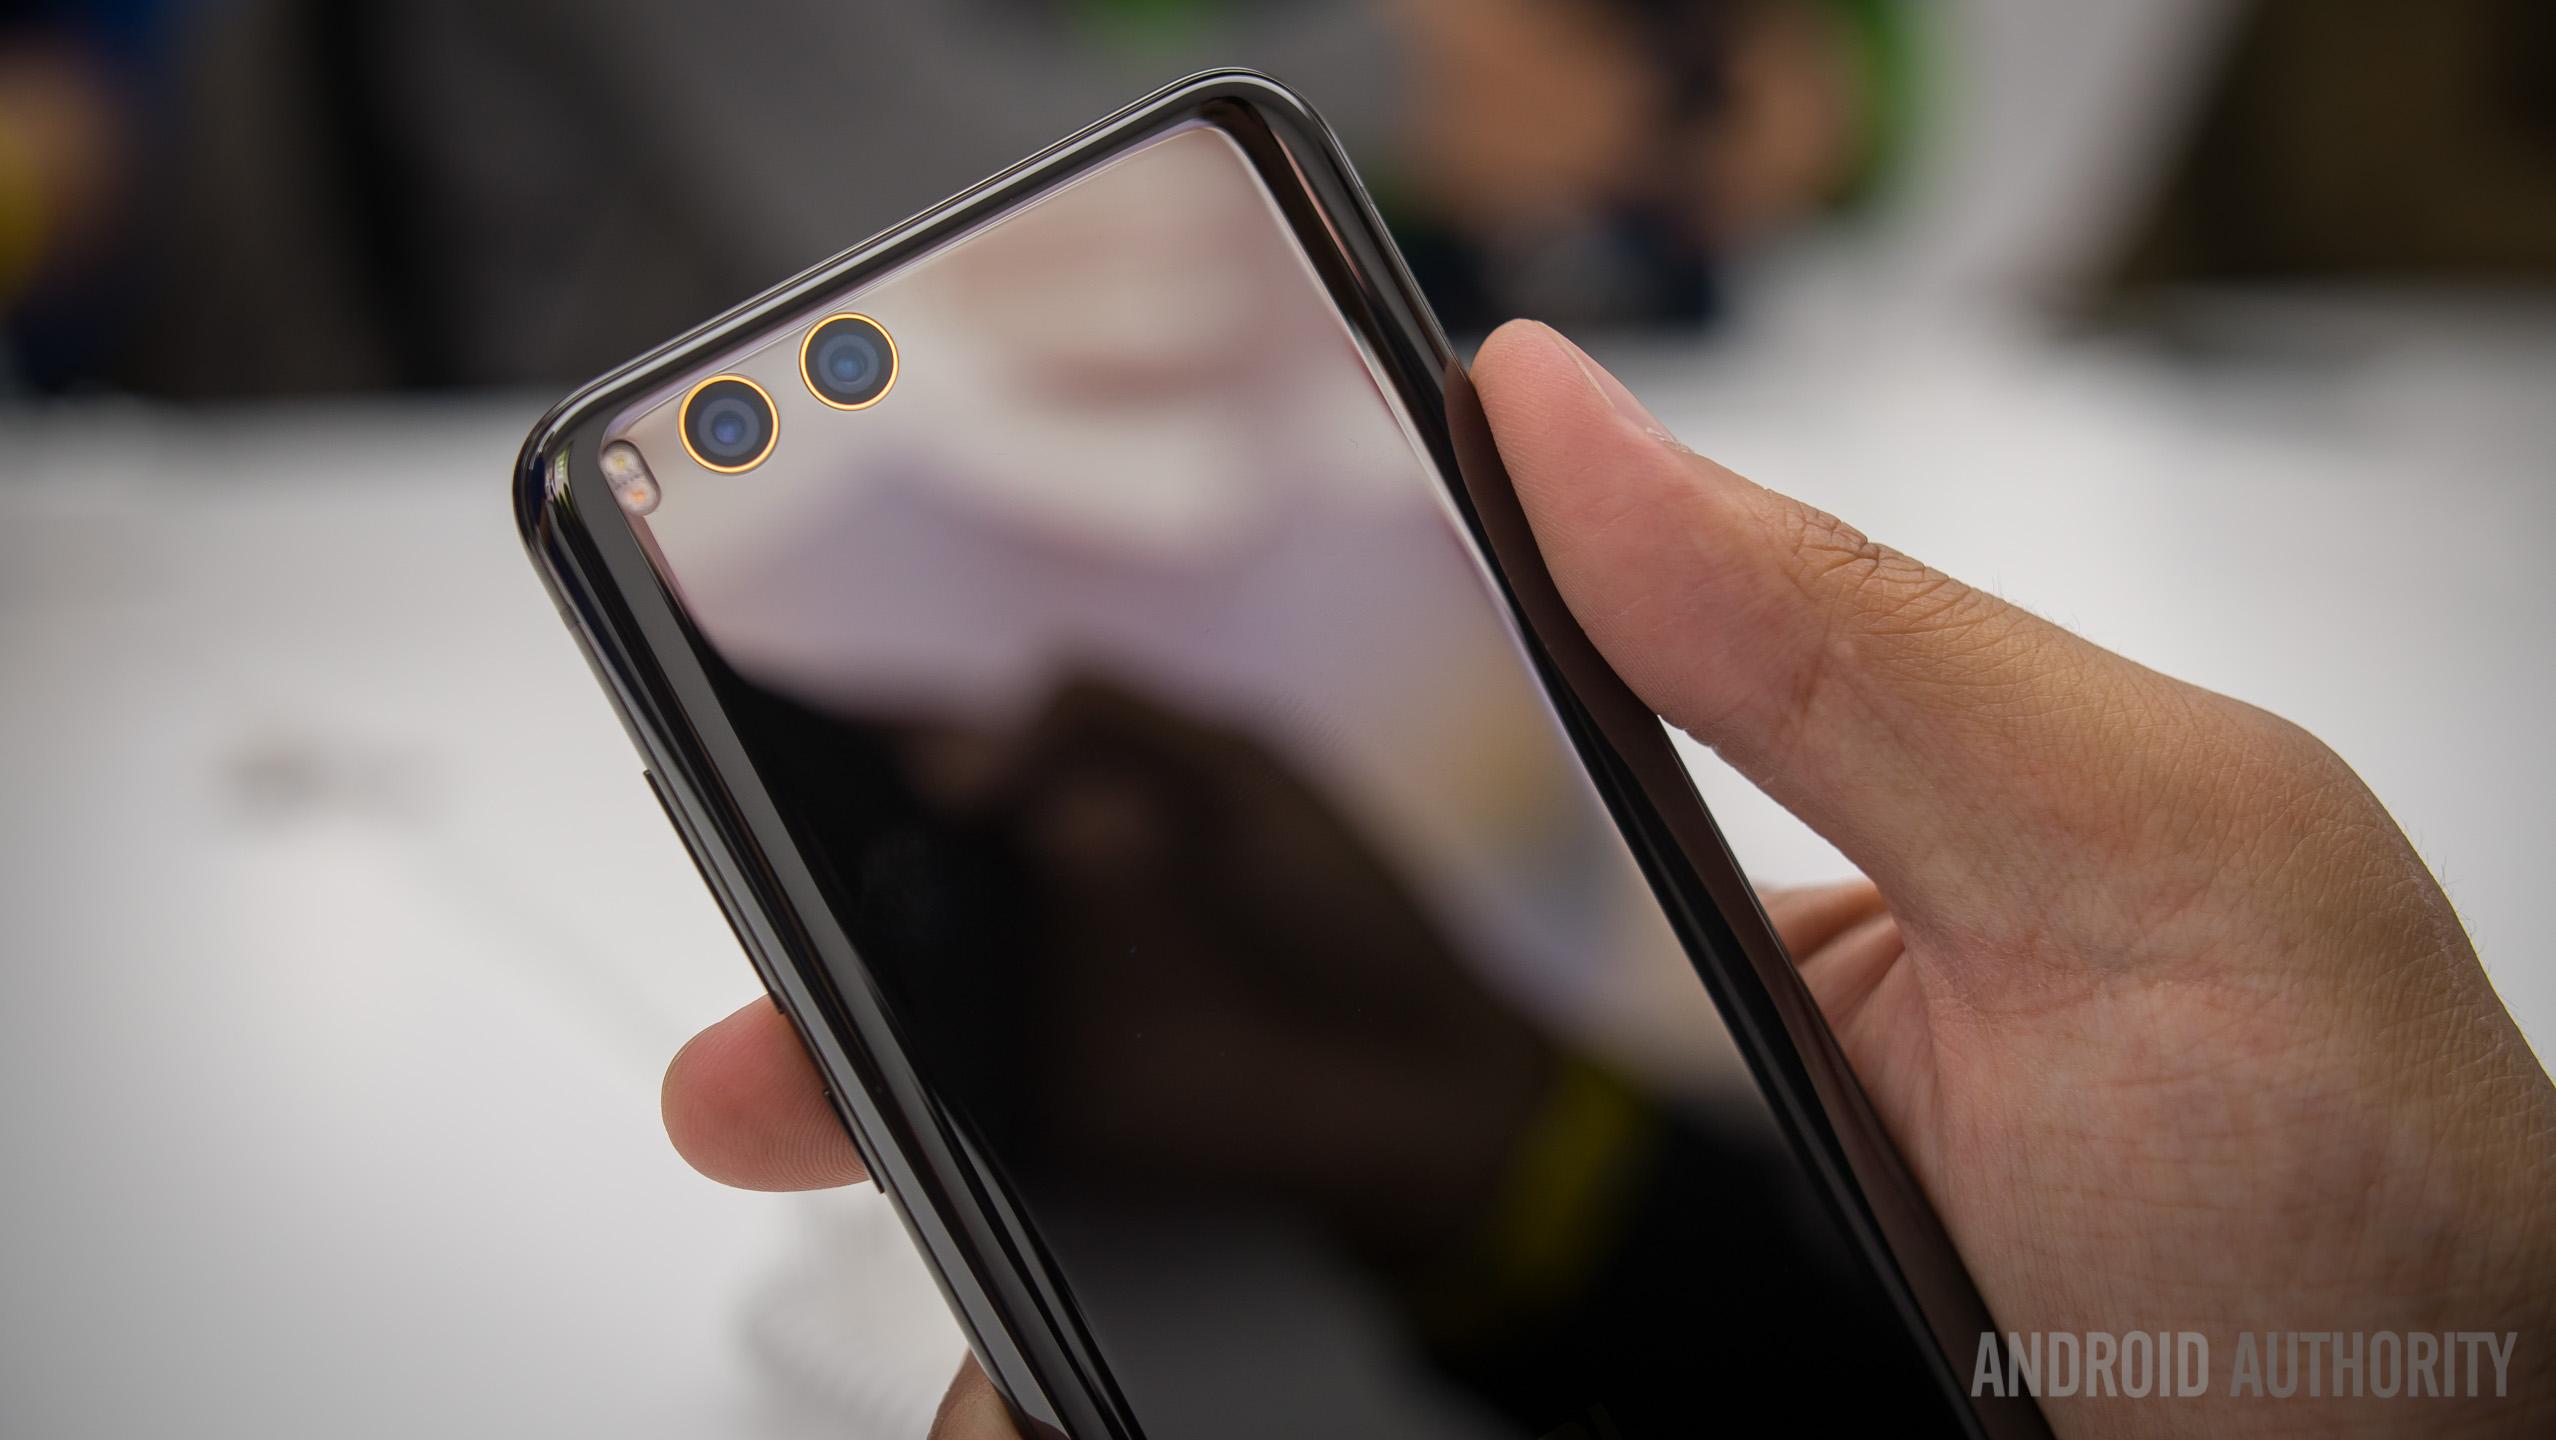 Xiaomi Mi 6 first impressions: The $360 flagship ...